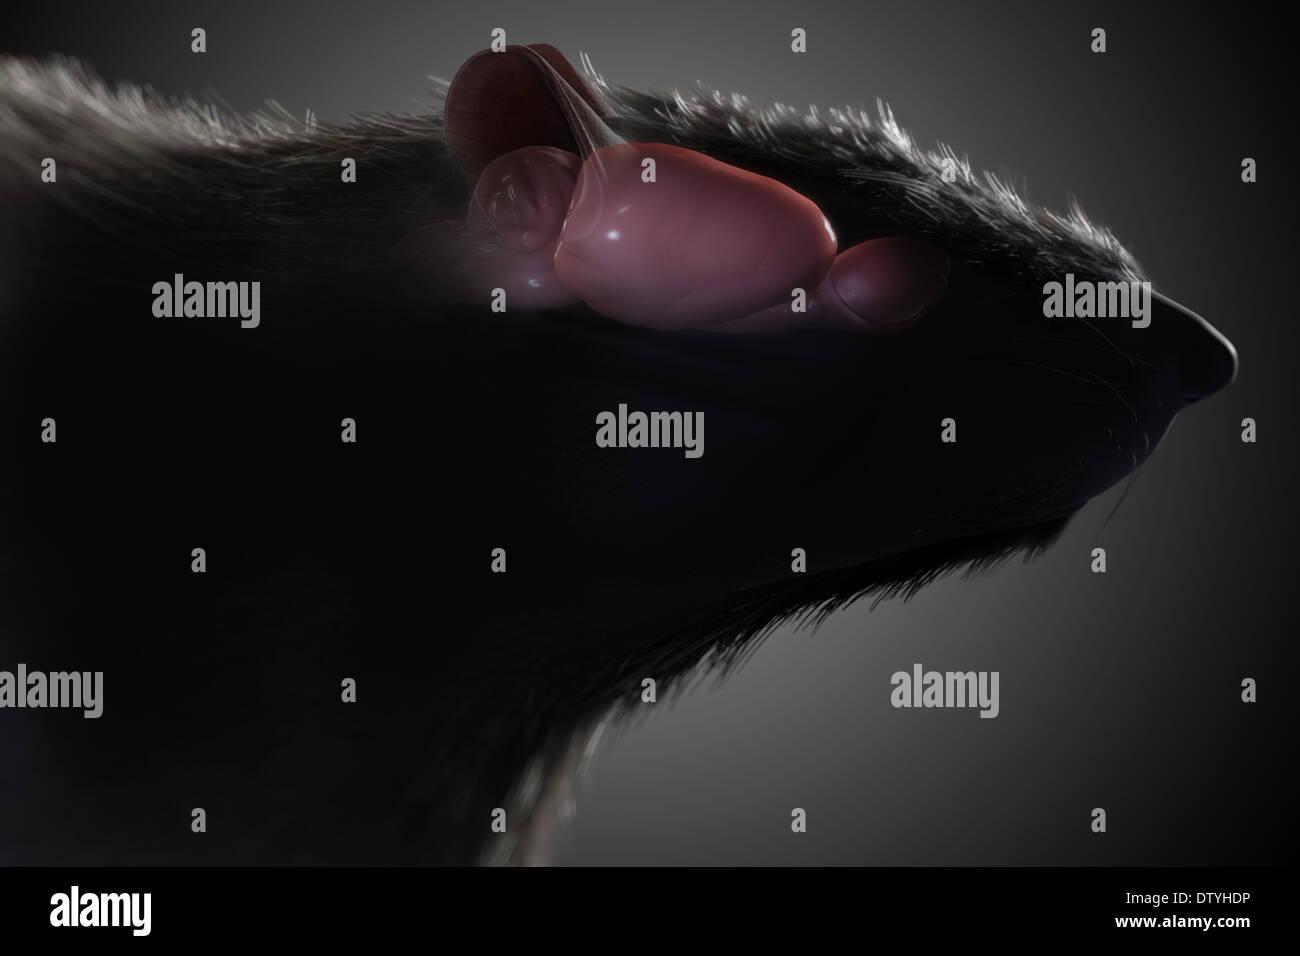 Rat Brain Anatomy Stock Photos & Rat Brain Anatomy Stock Images - Alamy